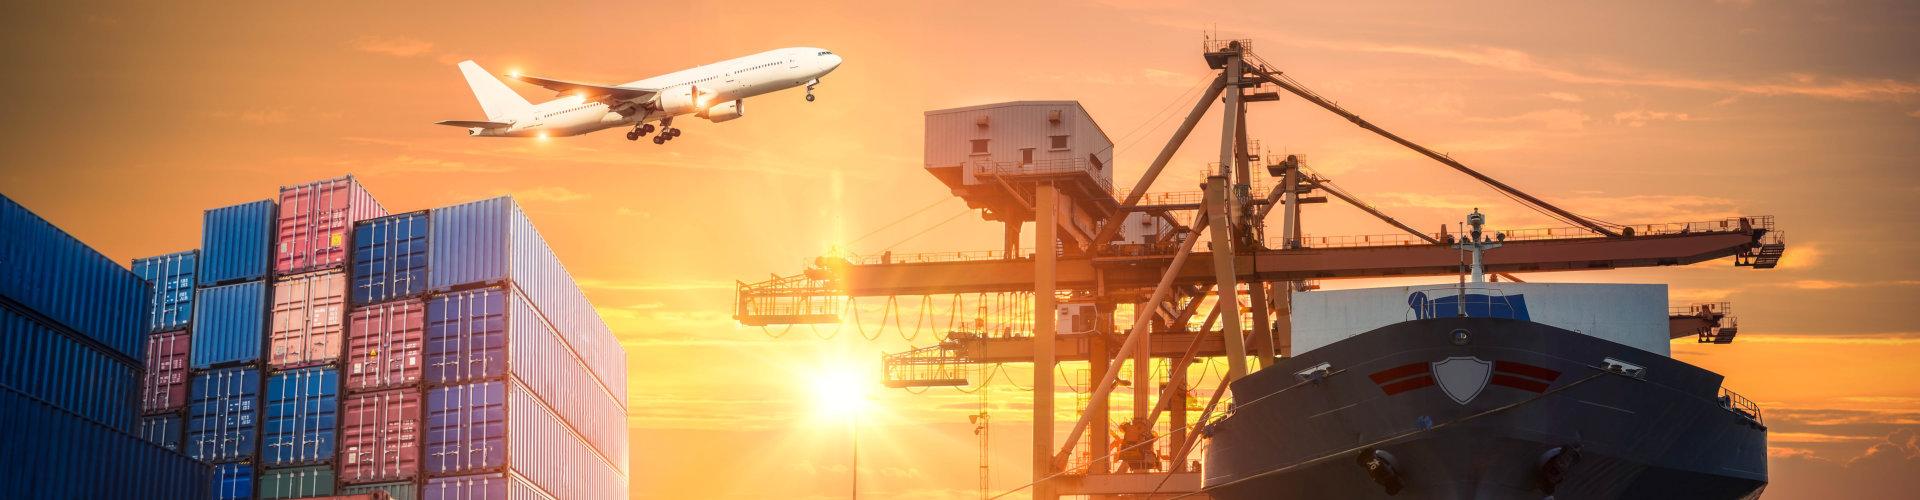 cargo holding port concept